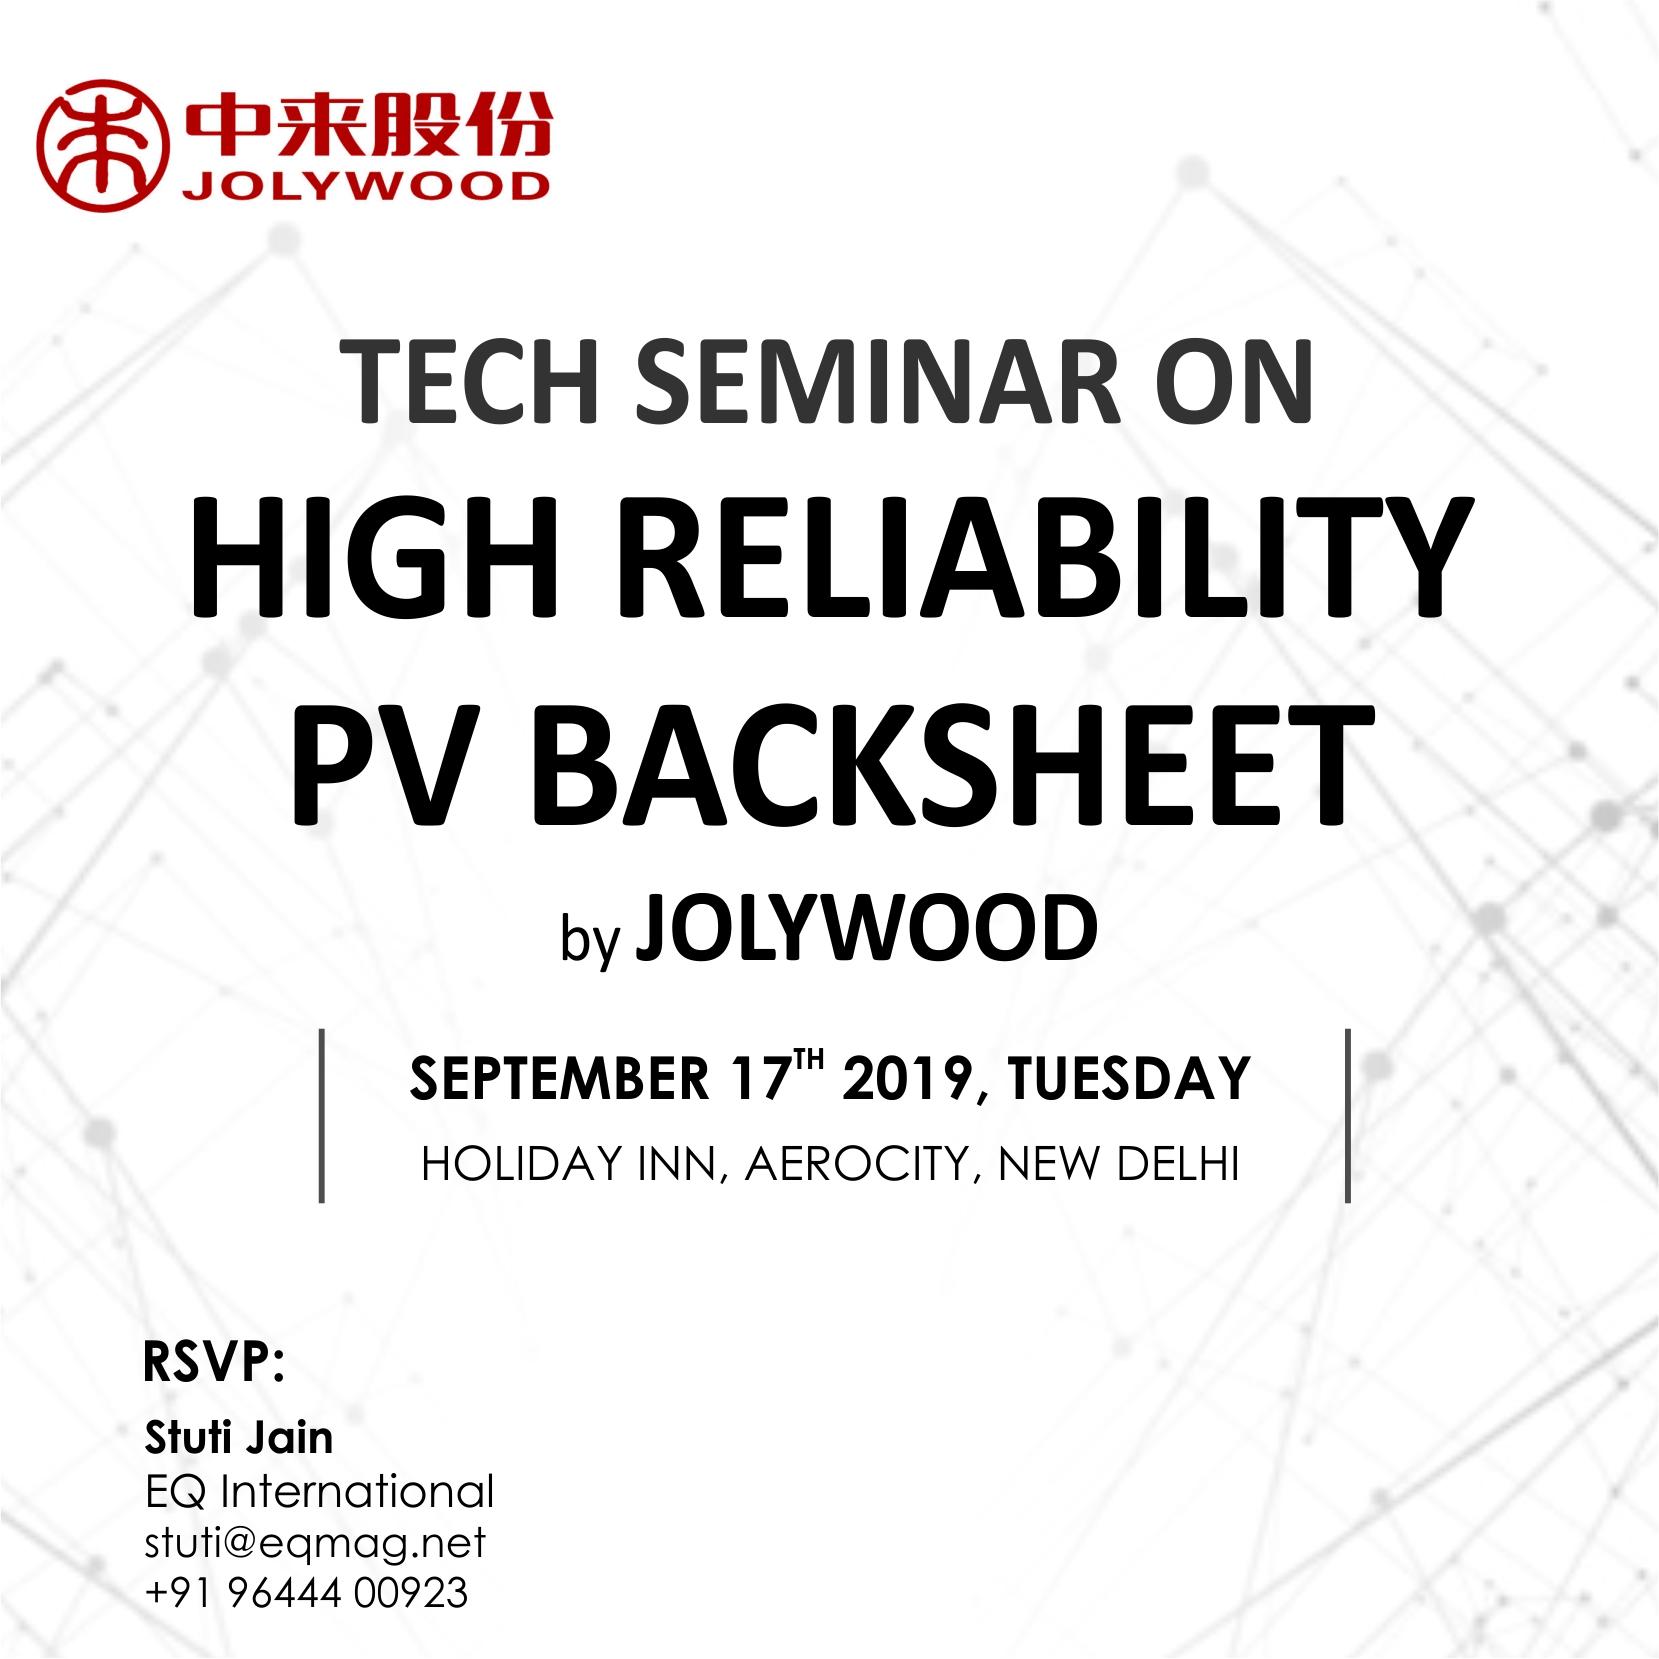 Tech Seminar on High Reliability PV BackSheet by Jolywood on Sept 17, 2019 at Holiday Inn Aerocity New Delhi…Register to Get Invitation